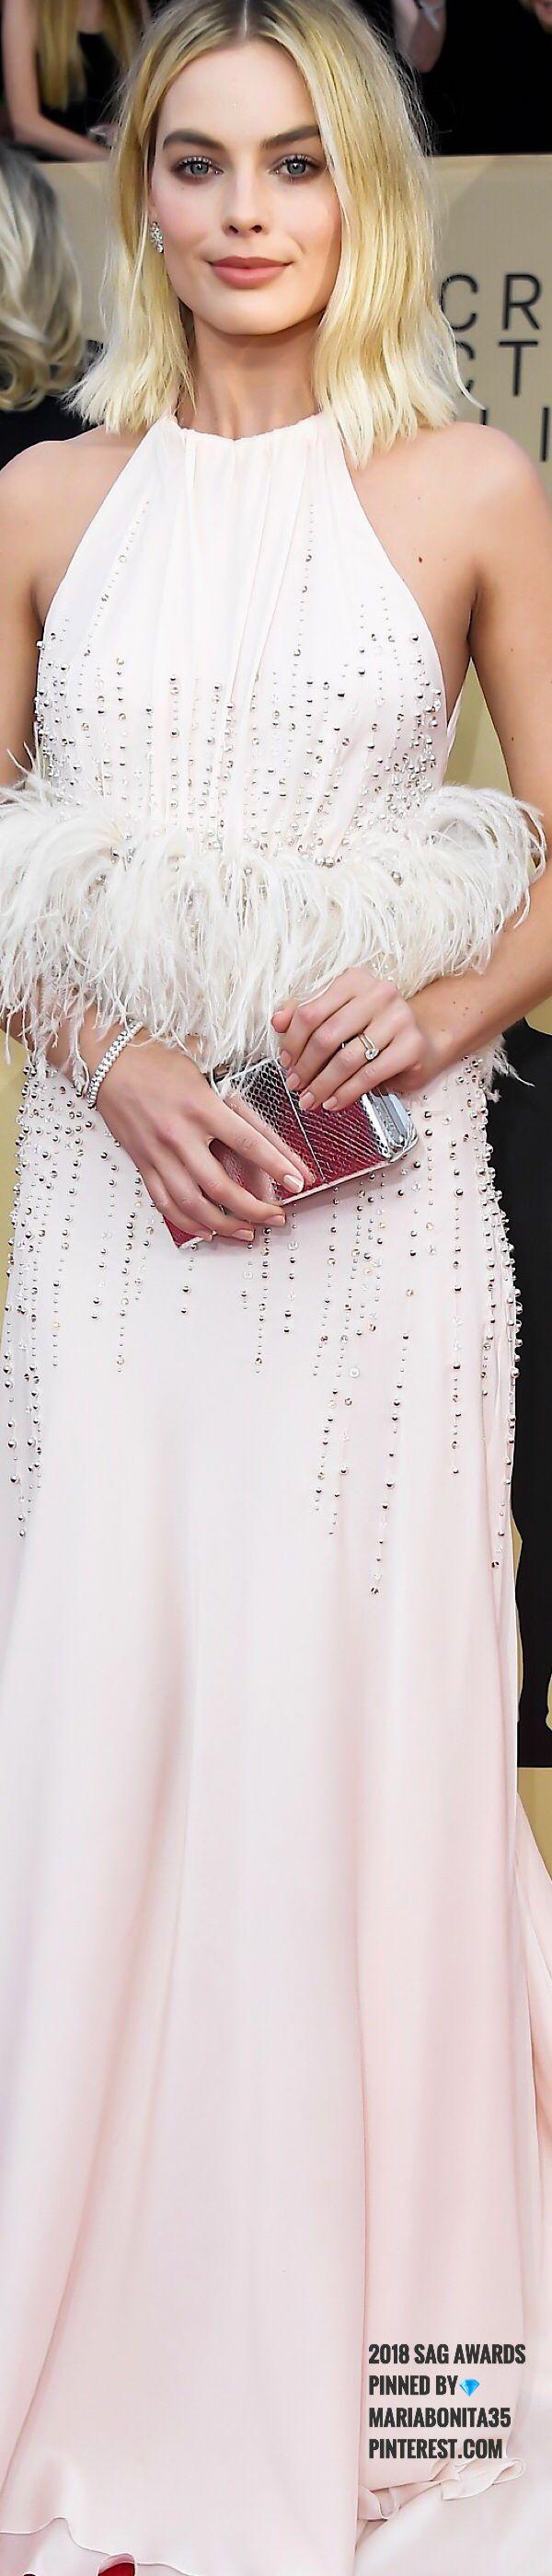 2018 SAG Awards Margot Robbie in Miu Miu